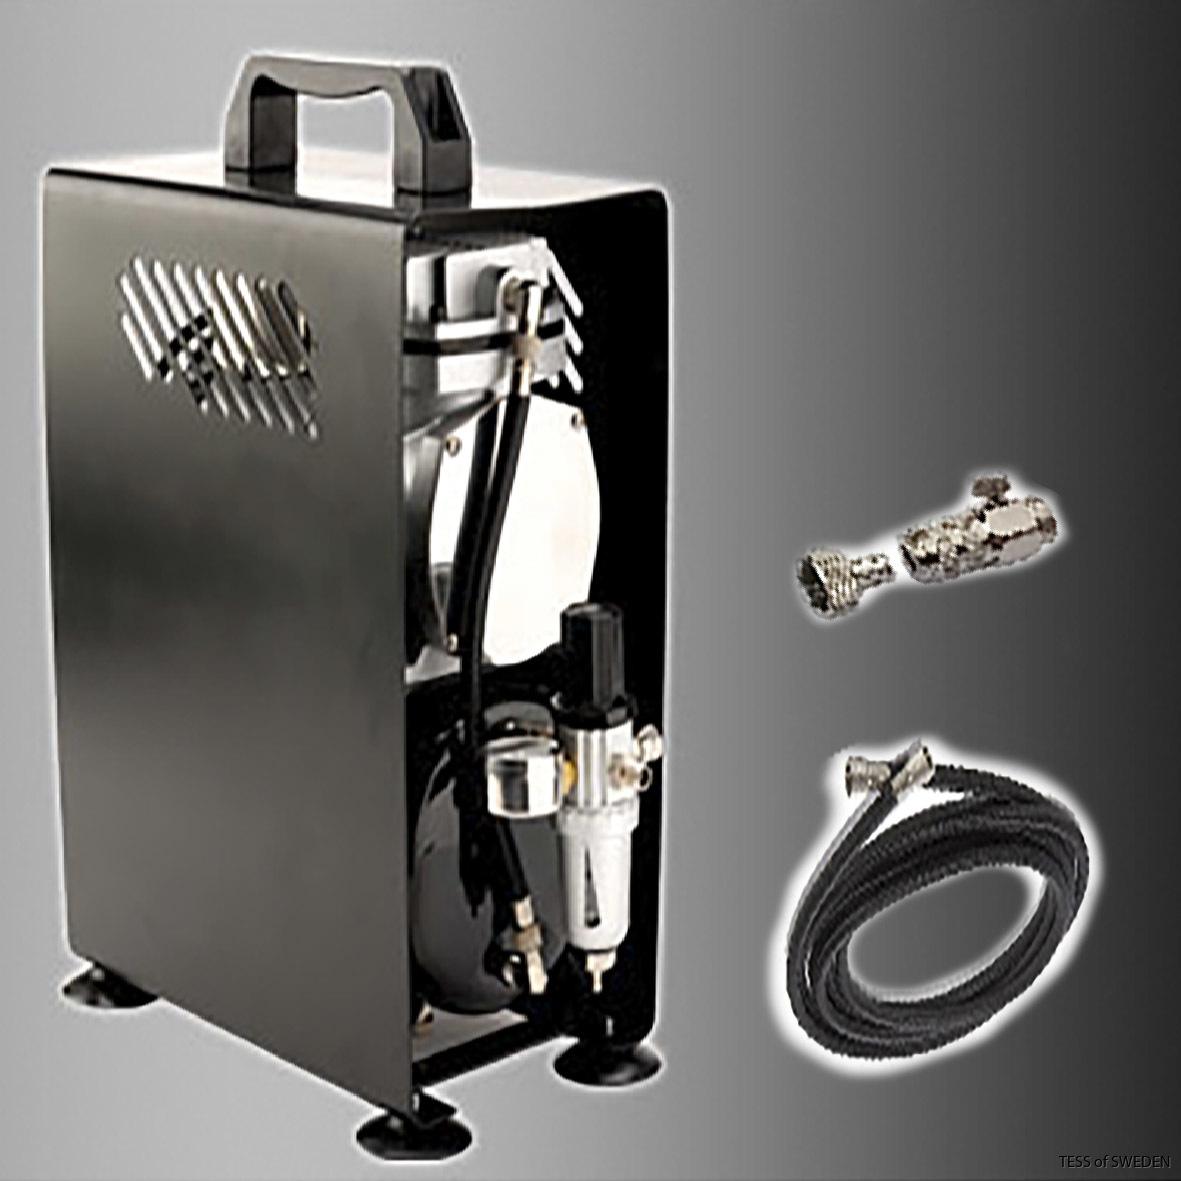 tc-610 kompressor med luftreglerare